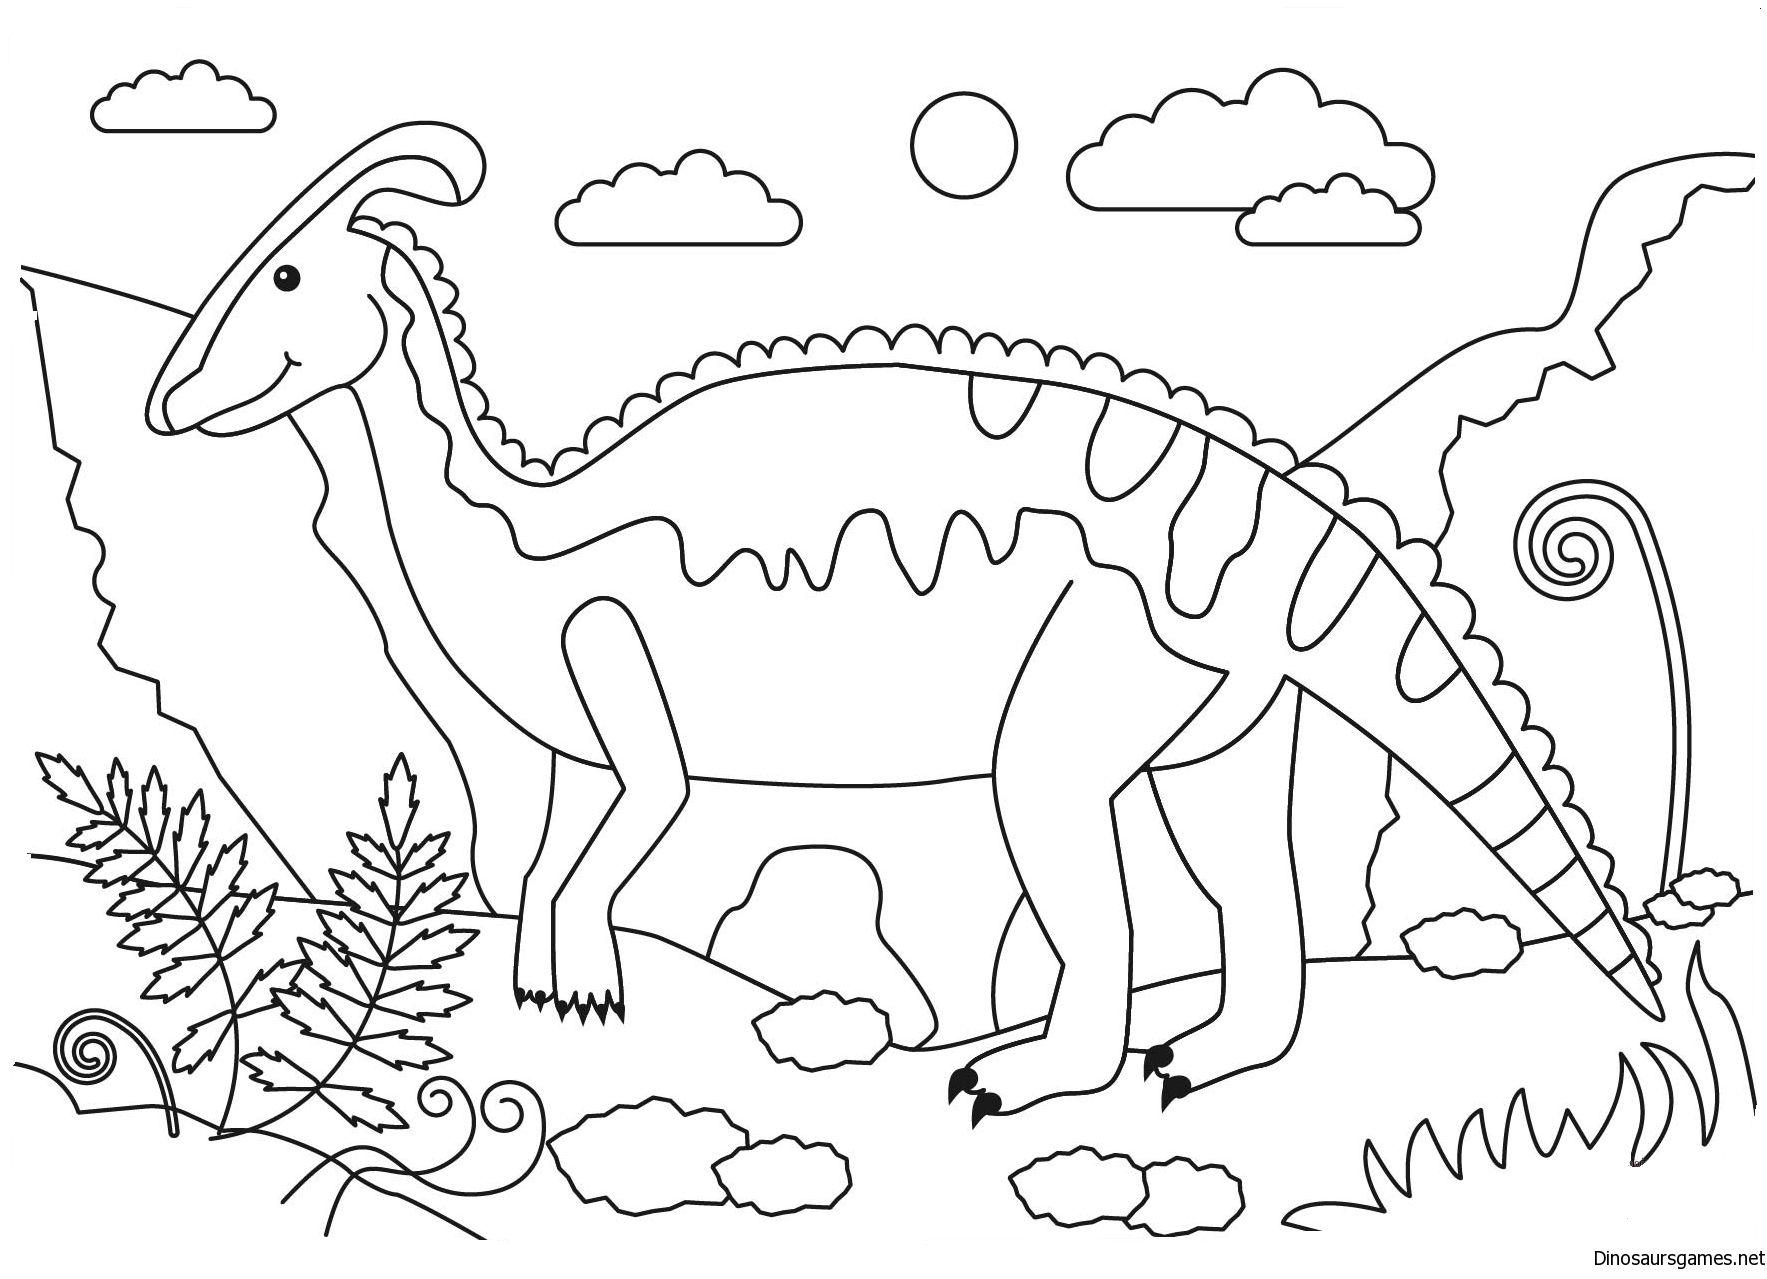 Enjoy Parasaurolophus Dinosaur Coloring Page At